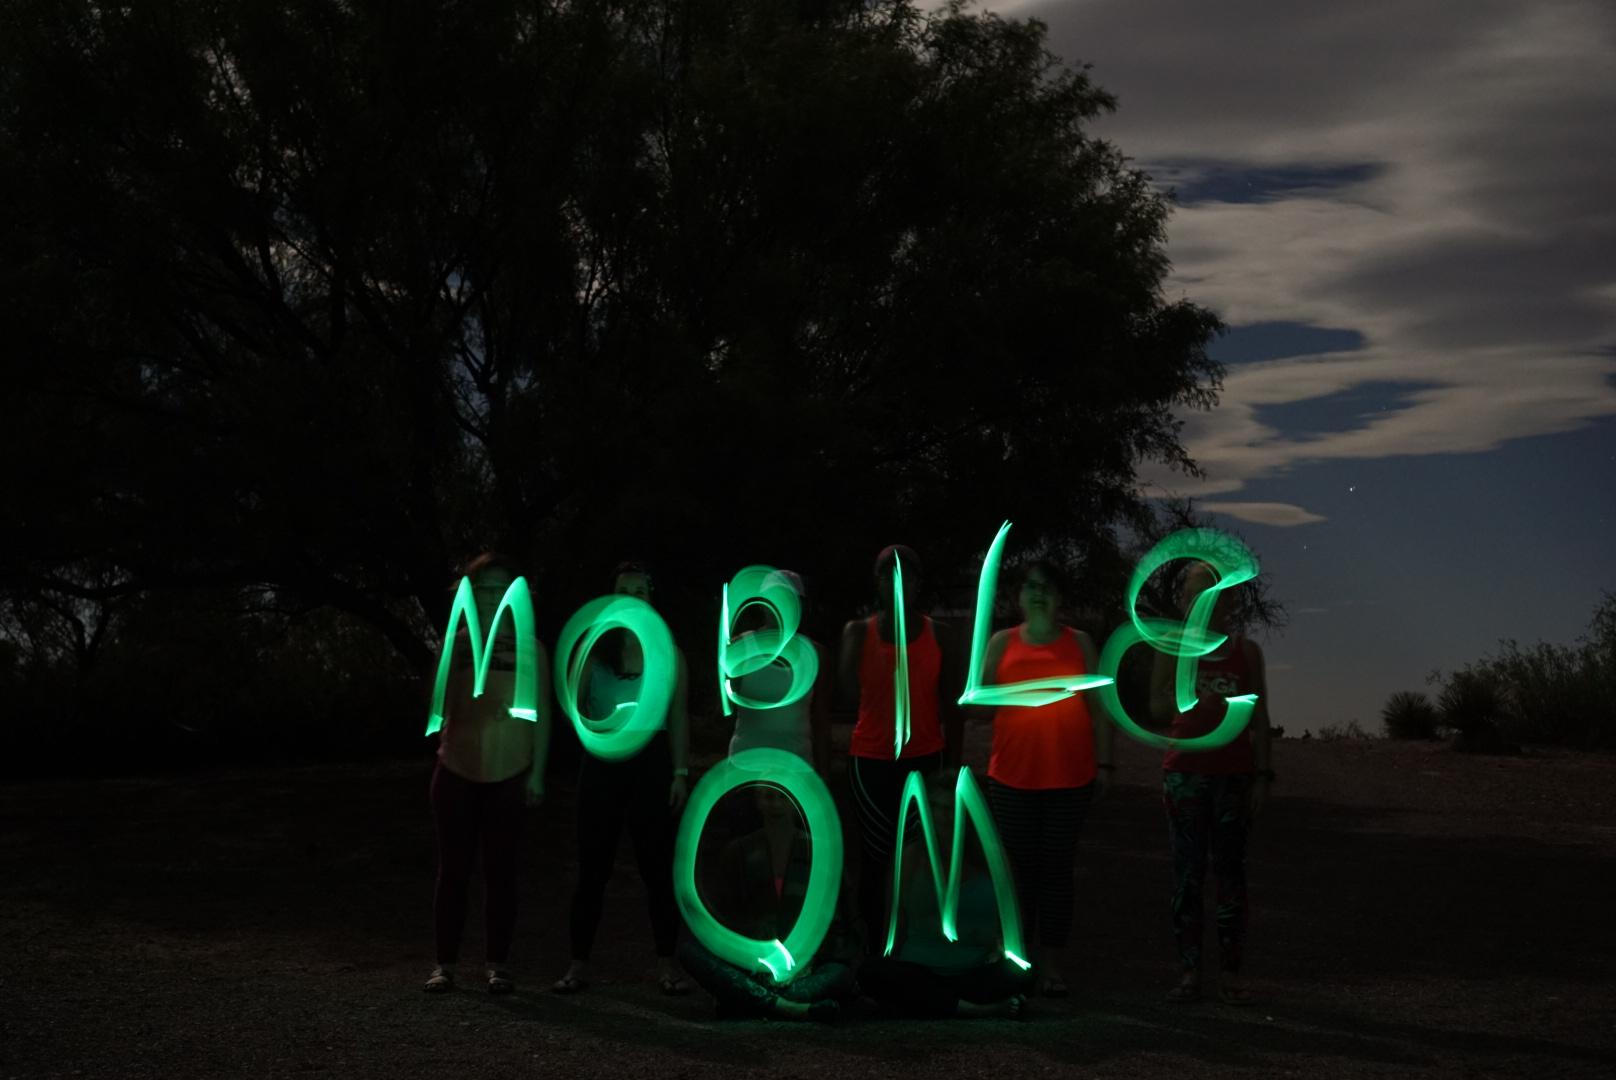 glow-stick-photos-alternative-sparkler-pictures-2